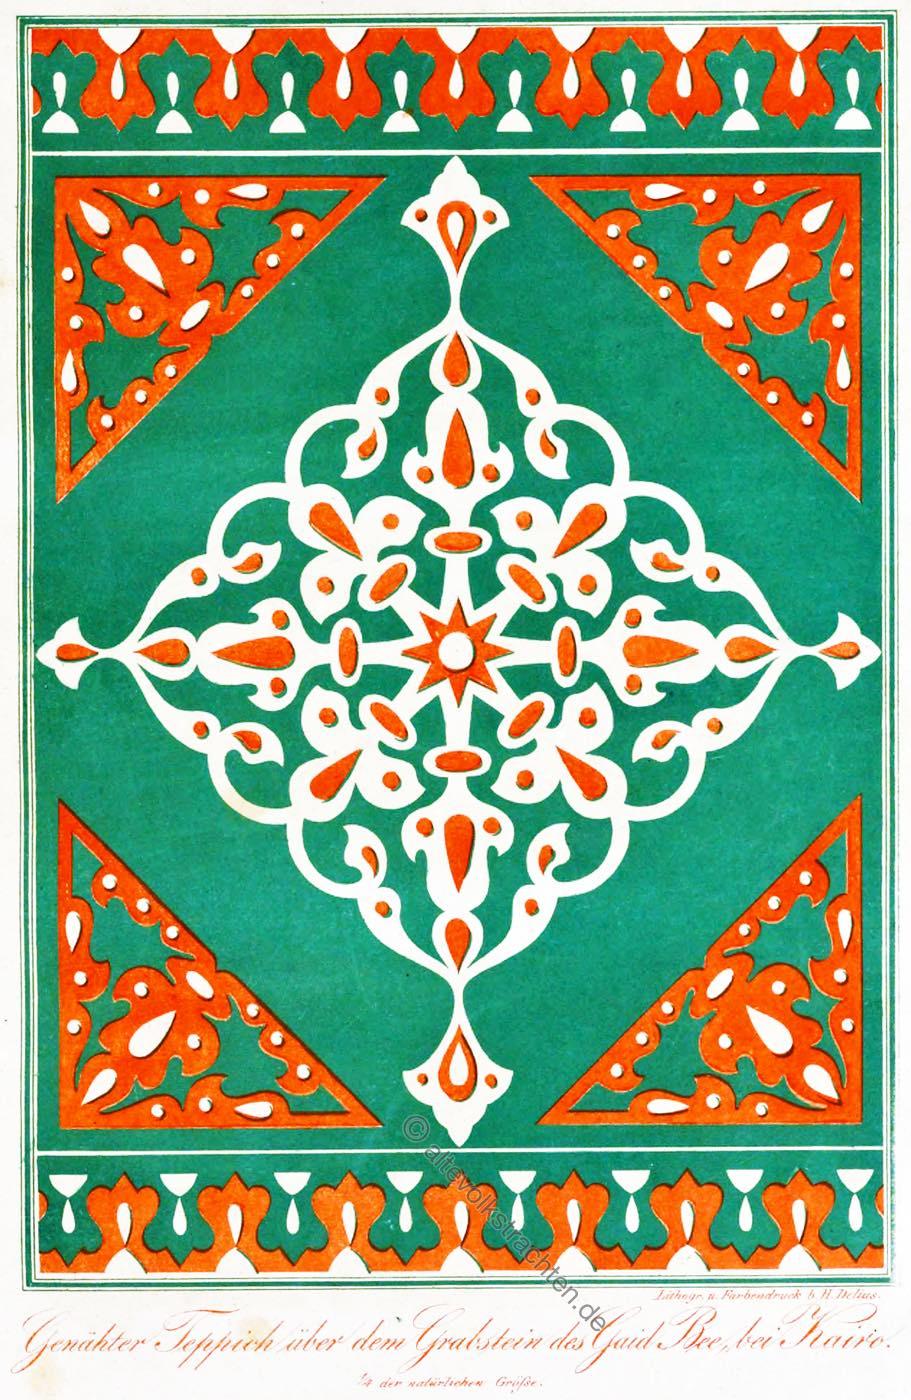 Teppich, Orientteppich, Ägypten, Design, Ornament, Sultan, Qaitbay